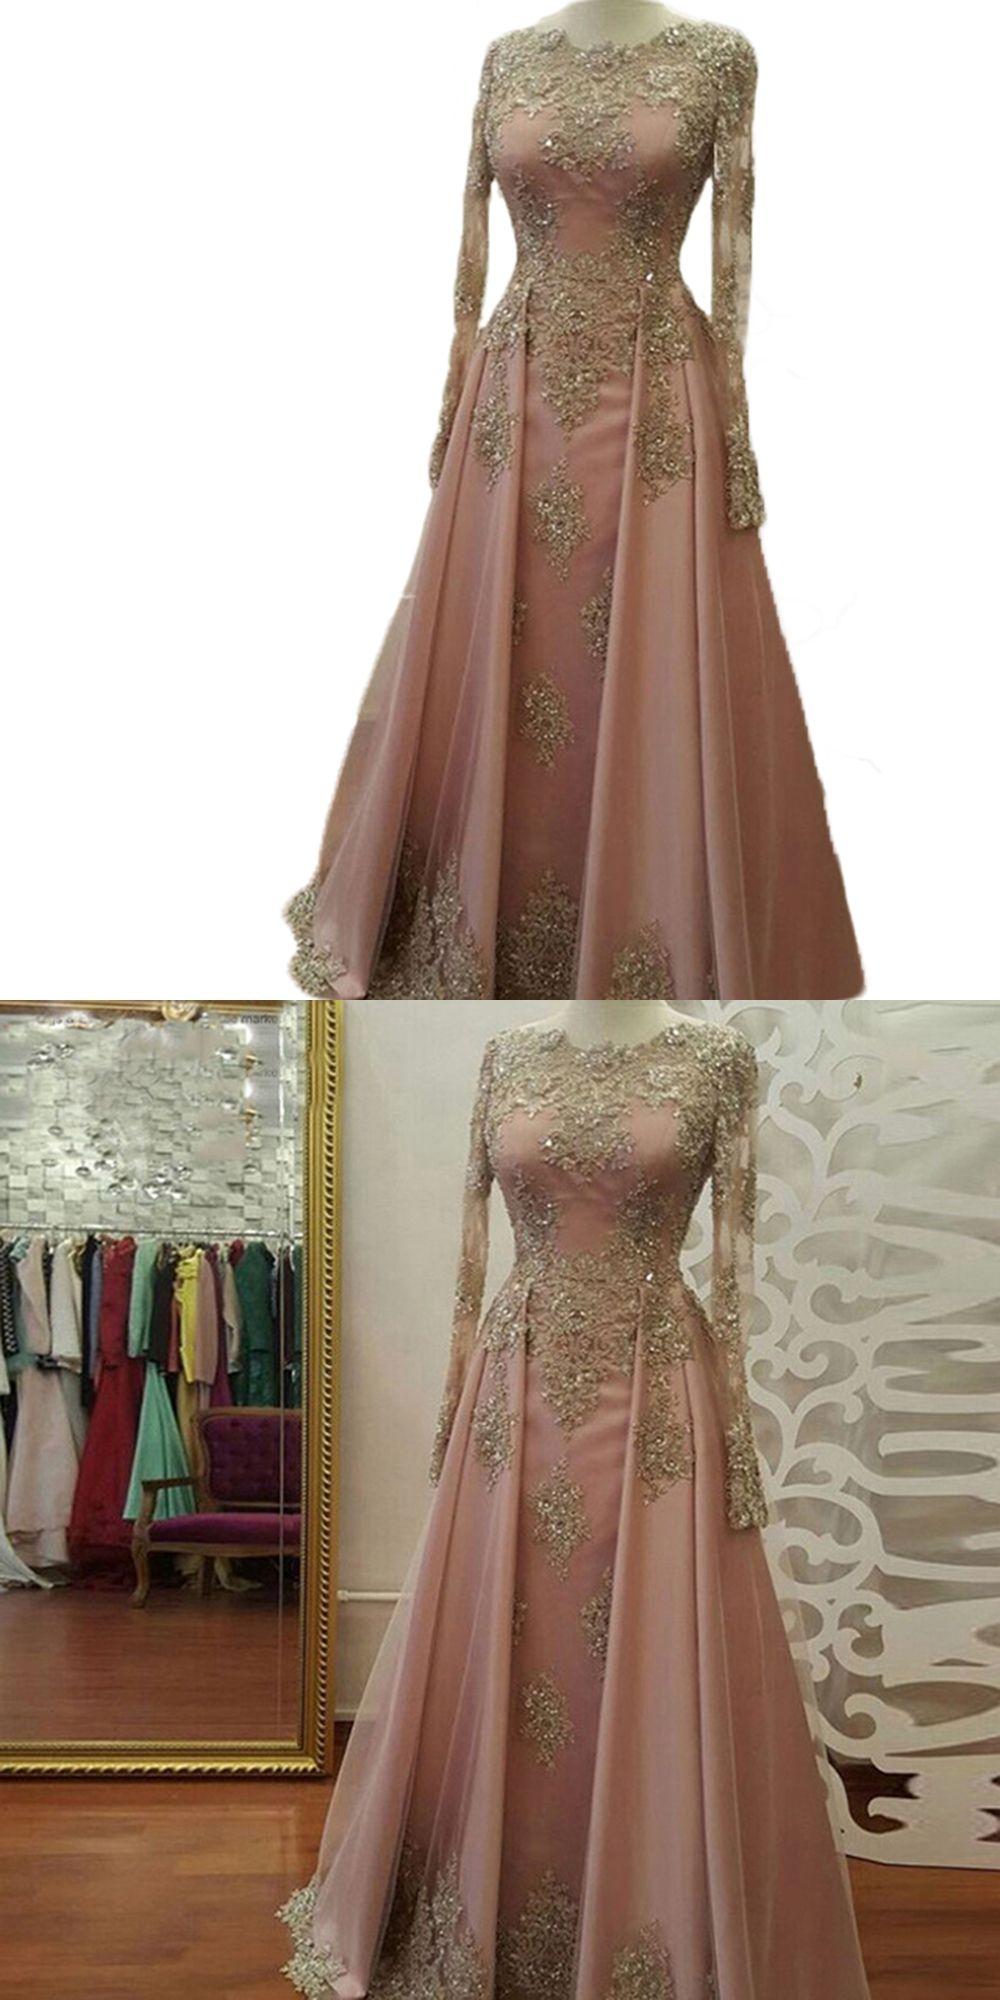 Elegant long prom dresses pink gold lace vestido de formatura muslim